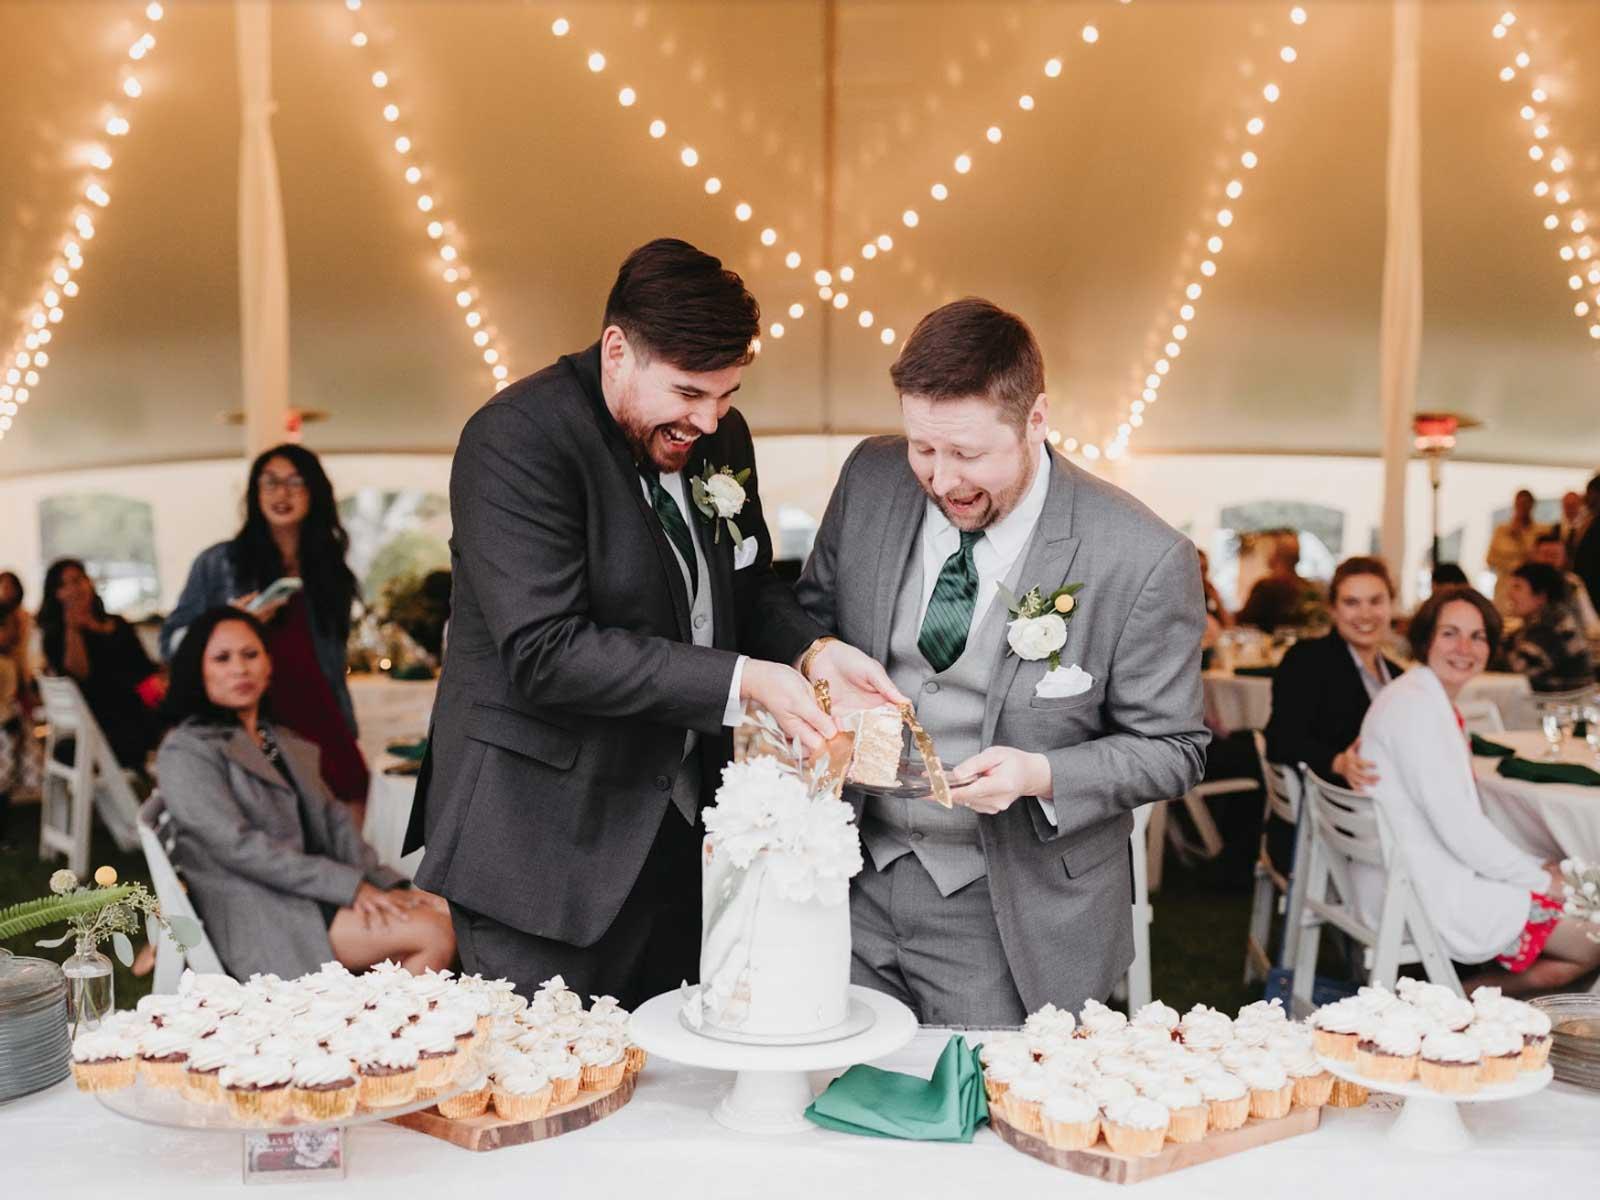 jon chris wedding cake